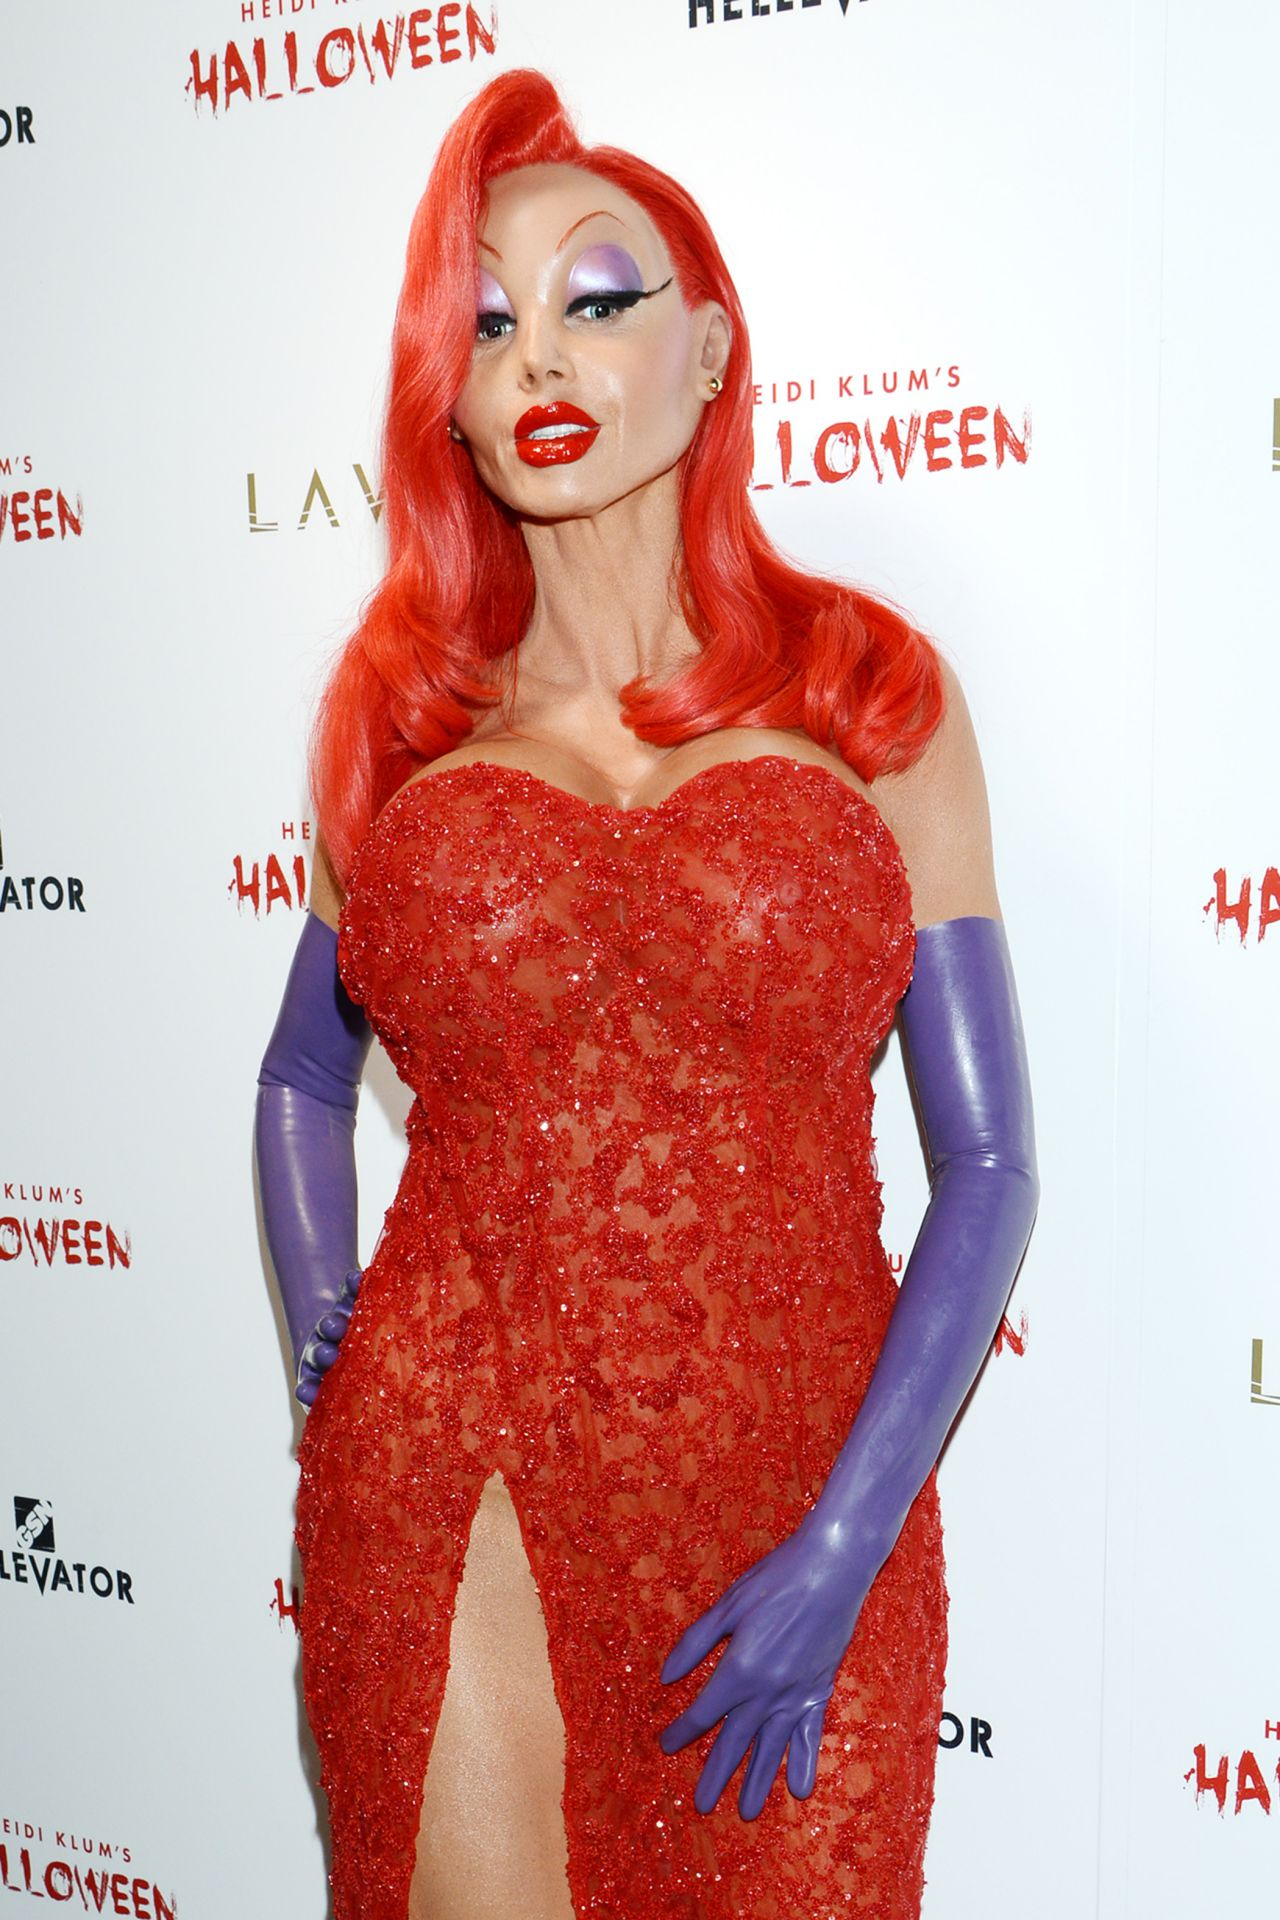 Klum – Heidi Klum Halloween Party in New York City, October 2015